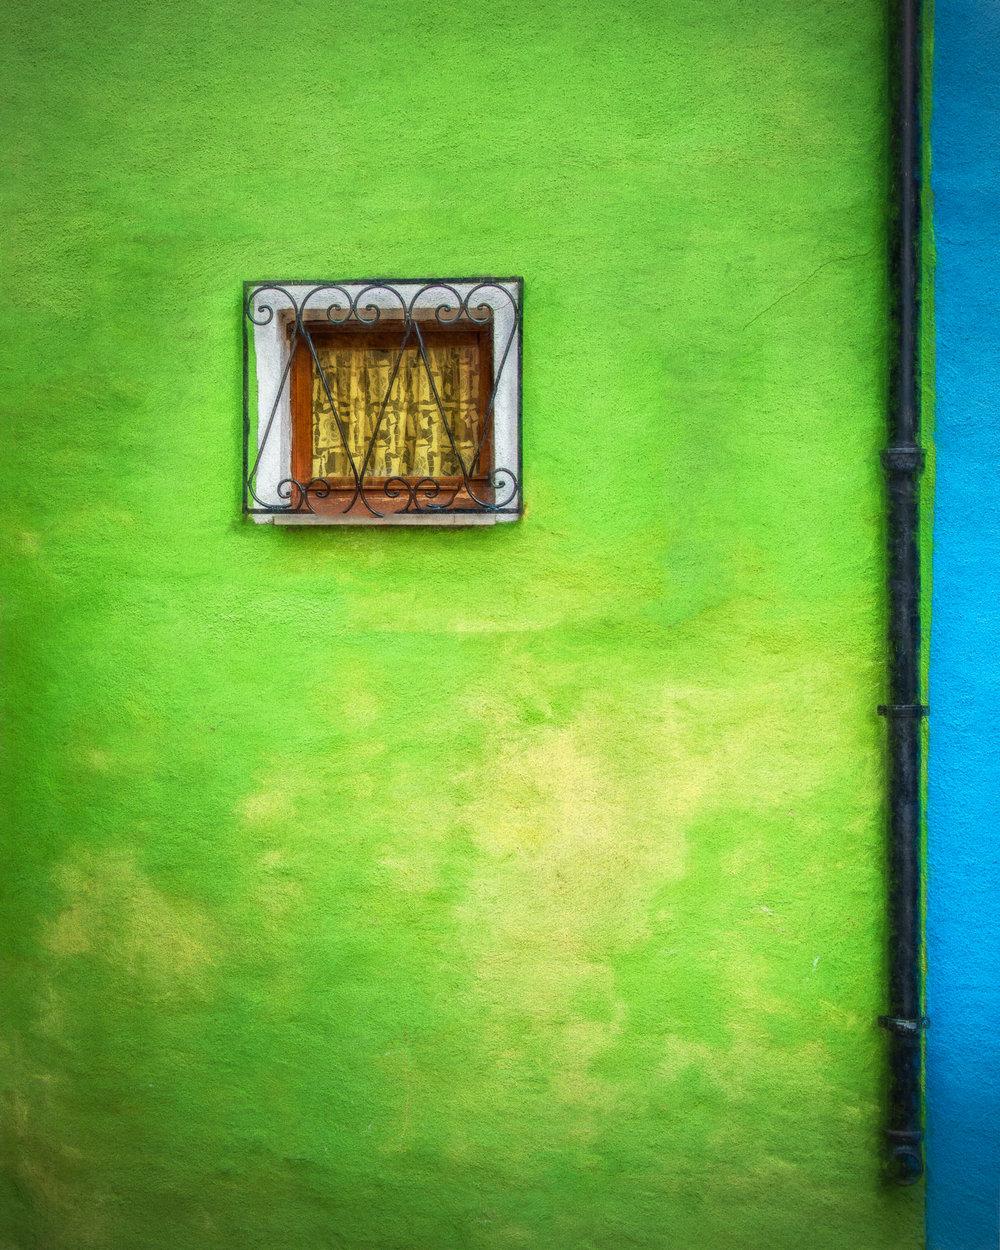 03-Windows-5.jpg